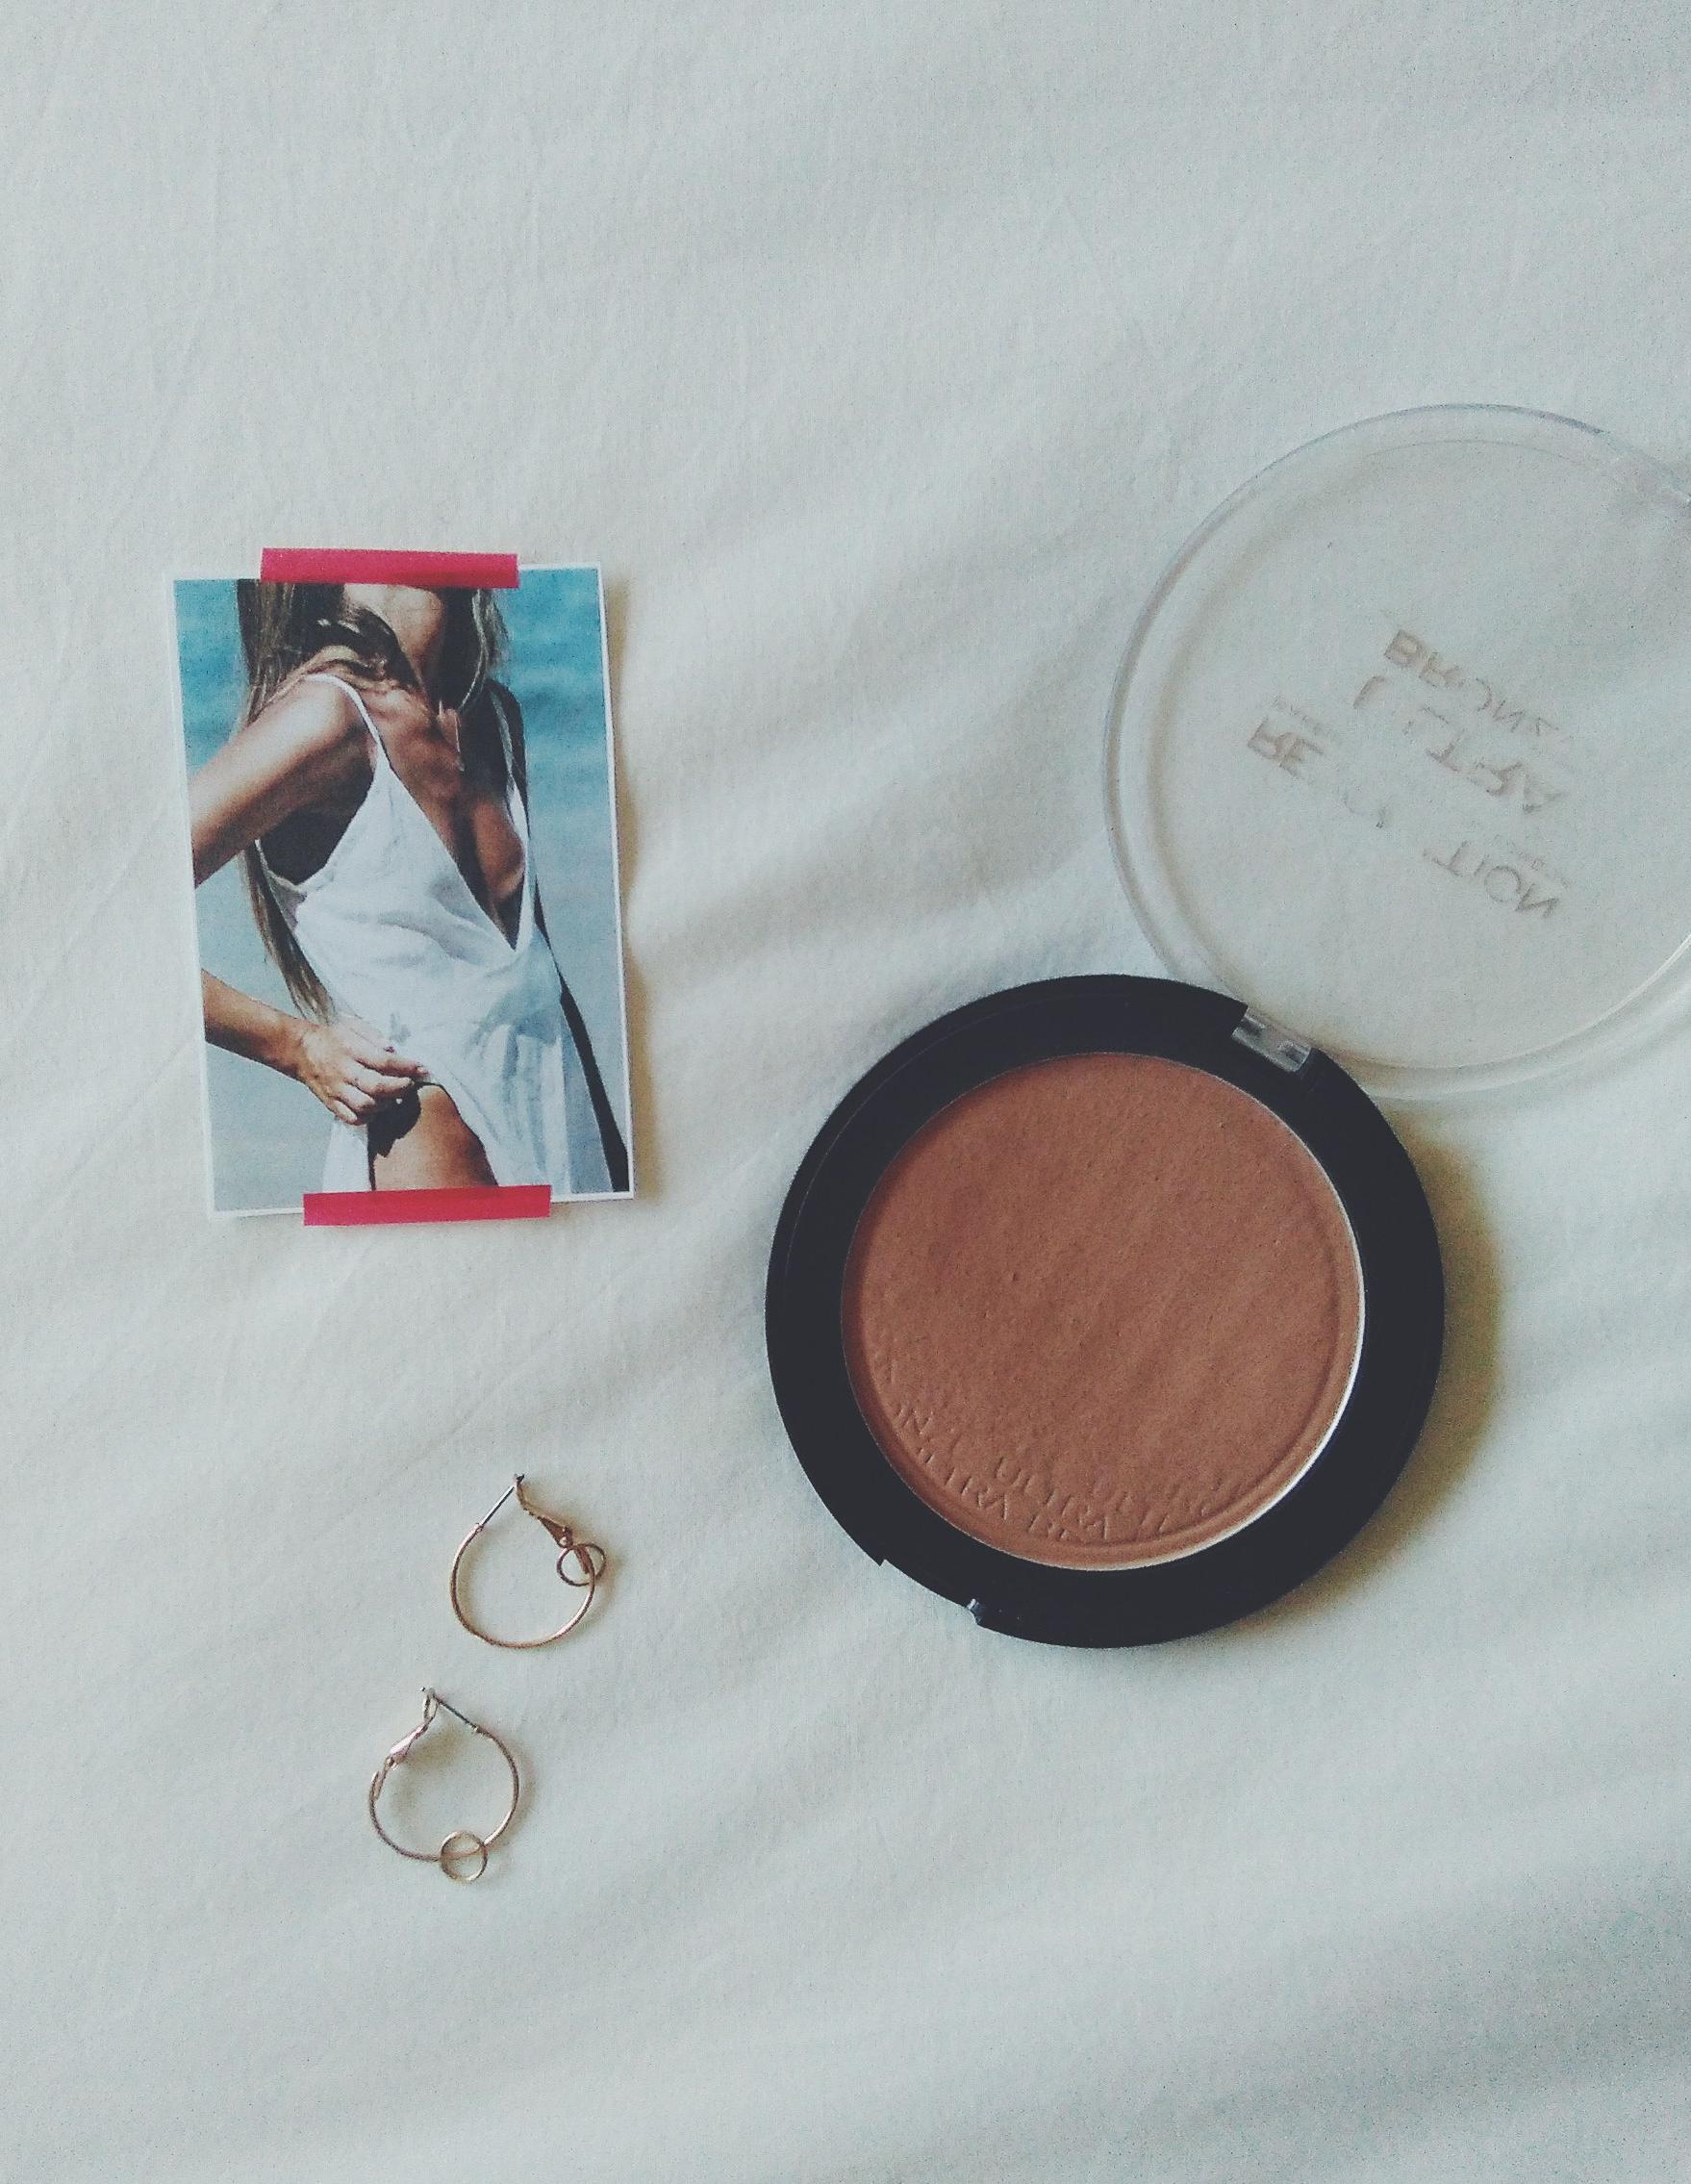 summer bronzer makeup revolution